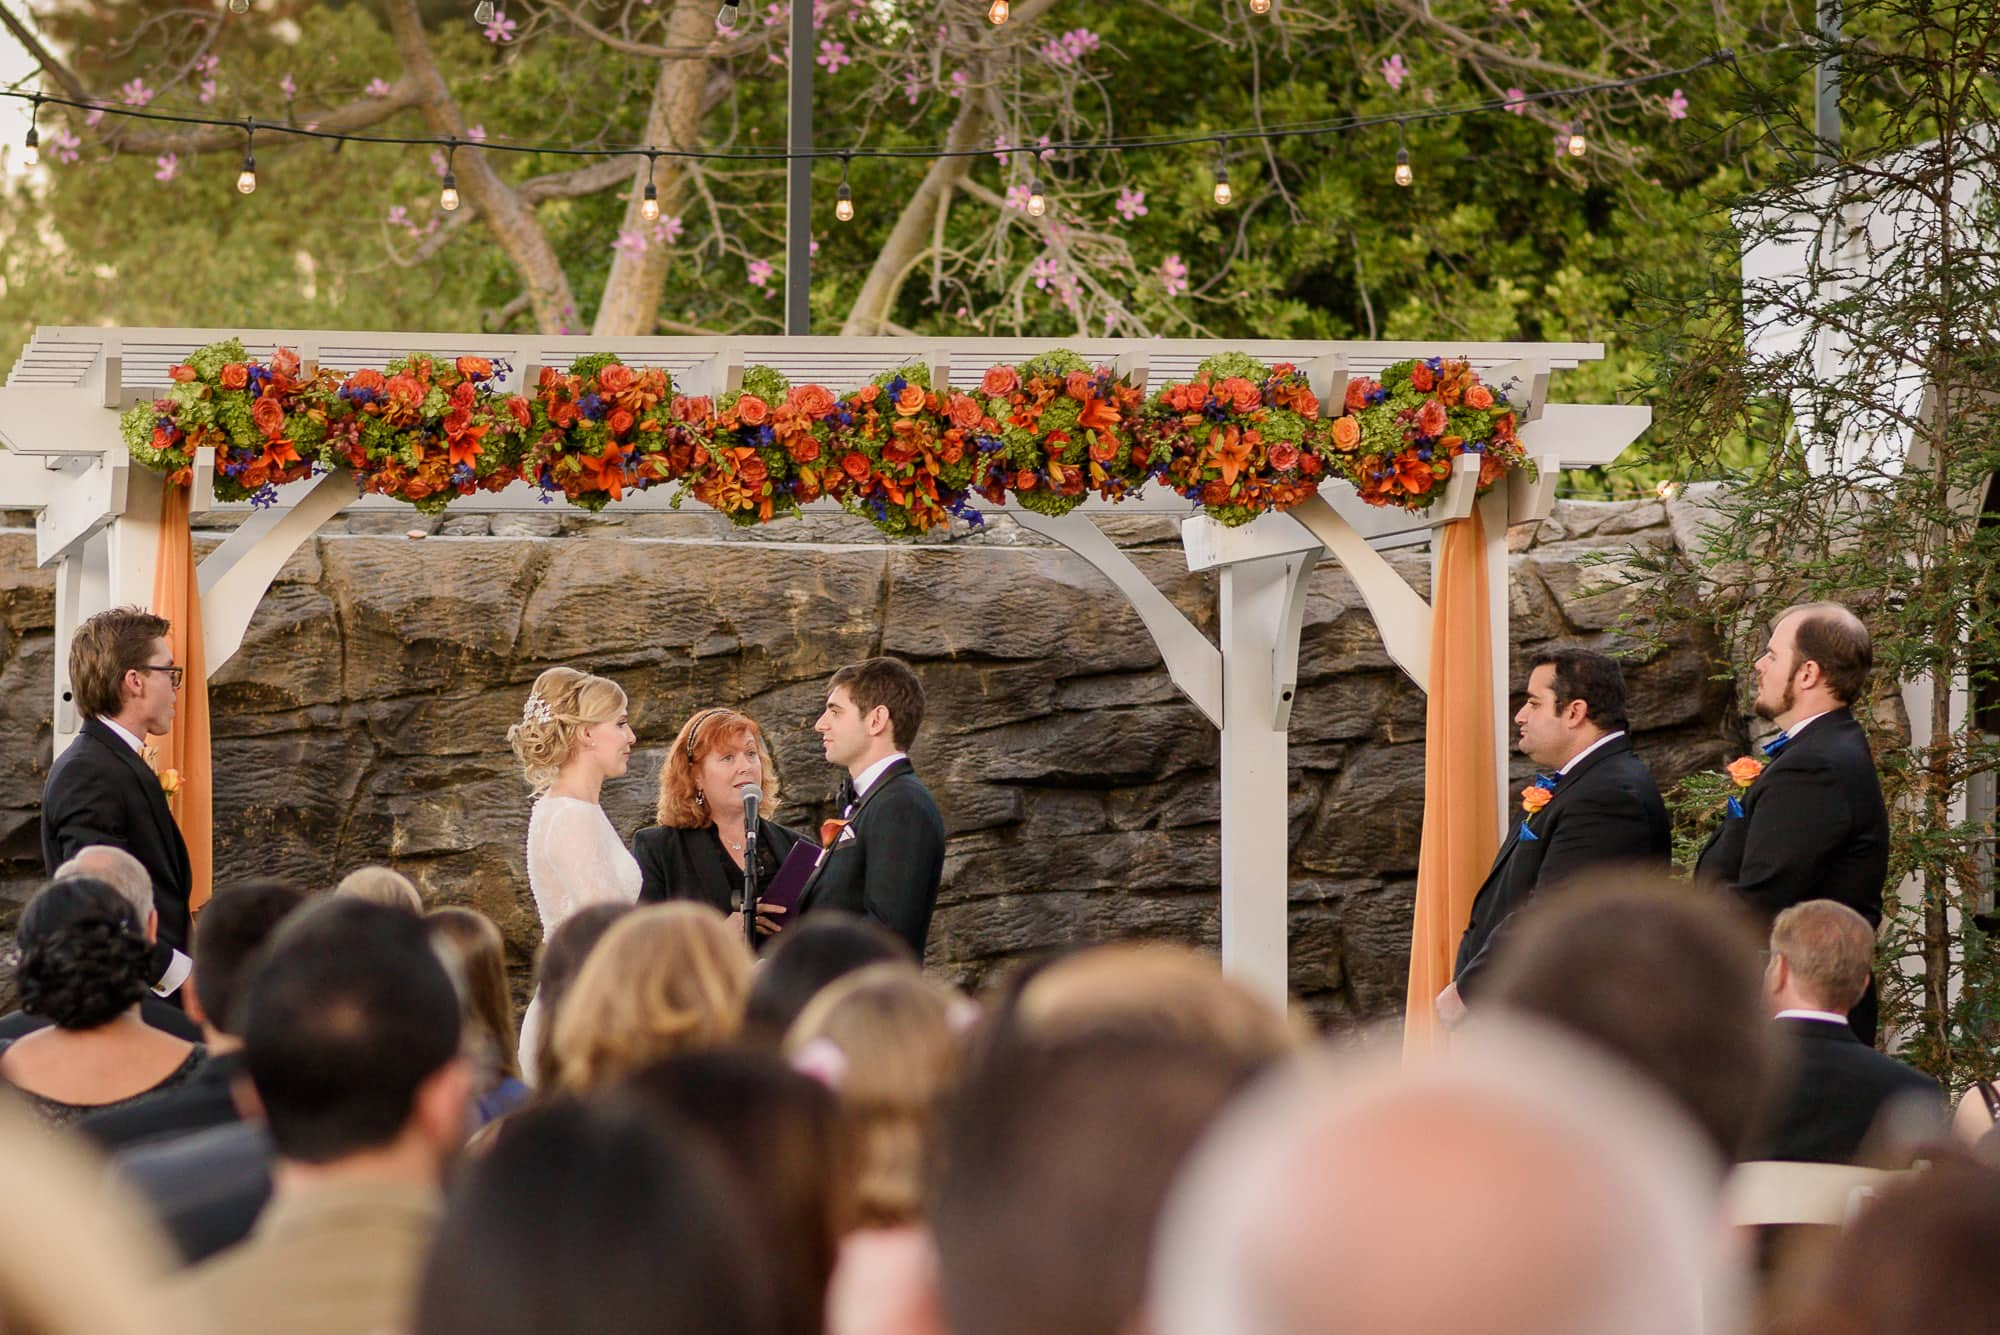 049_Alan_and_Heidi_Los_Angeles_Equestrian_Center_Wedding